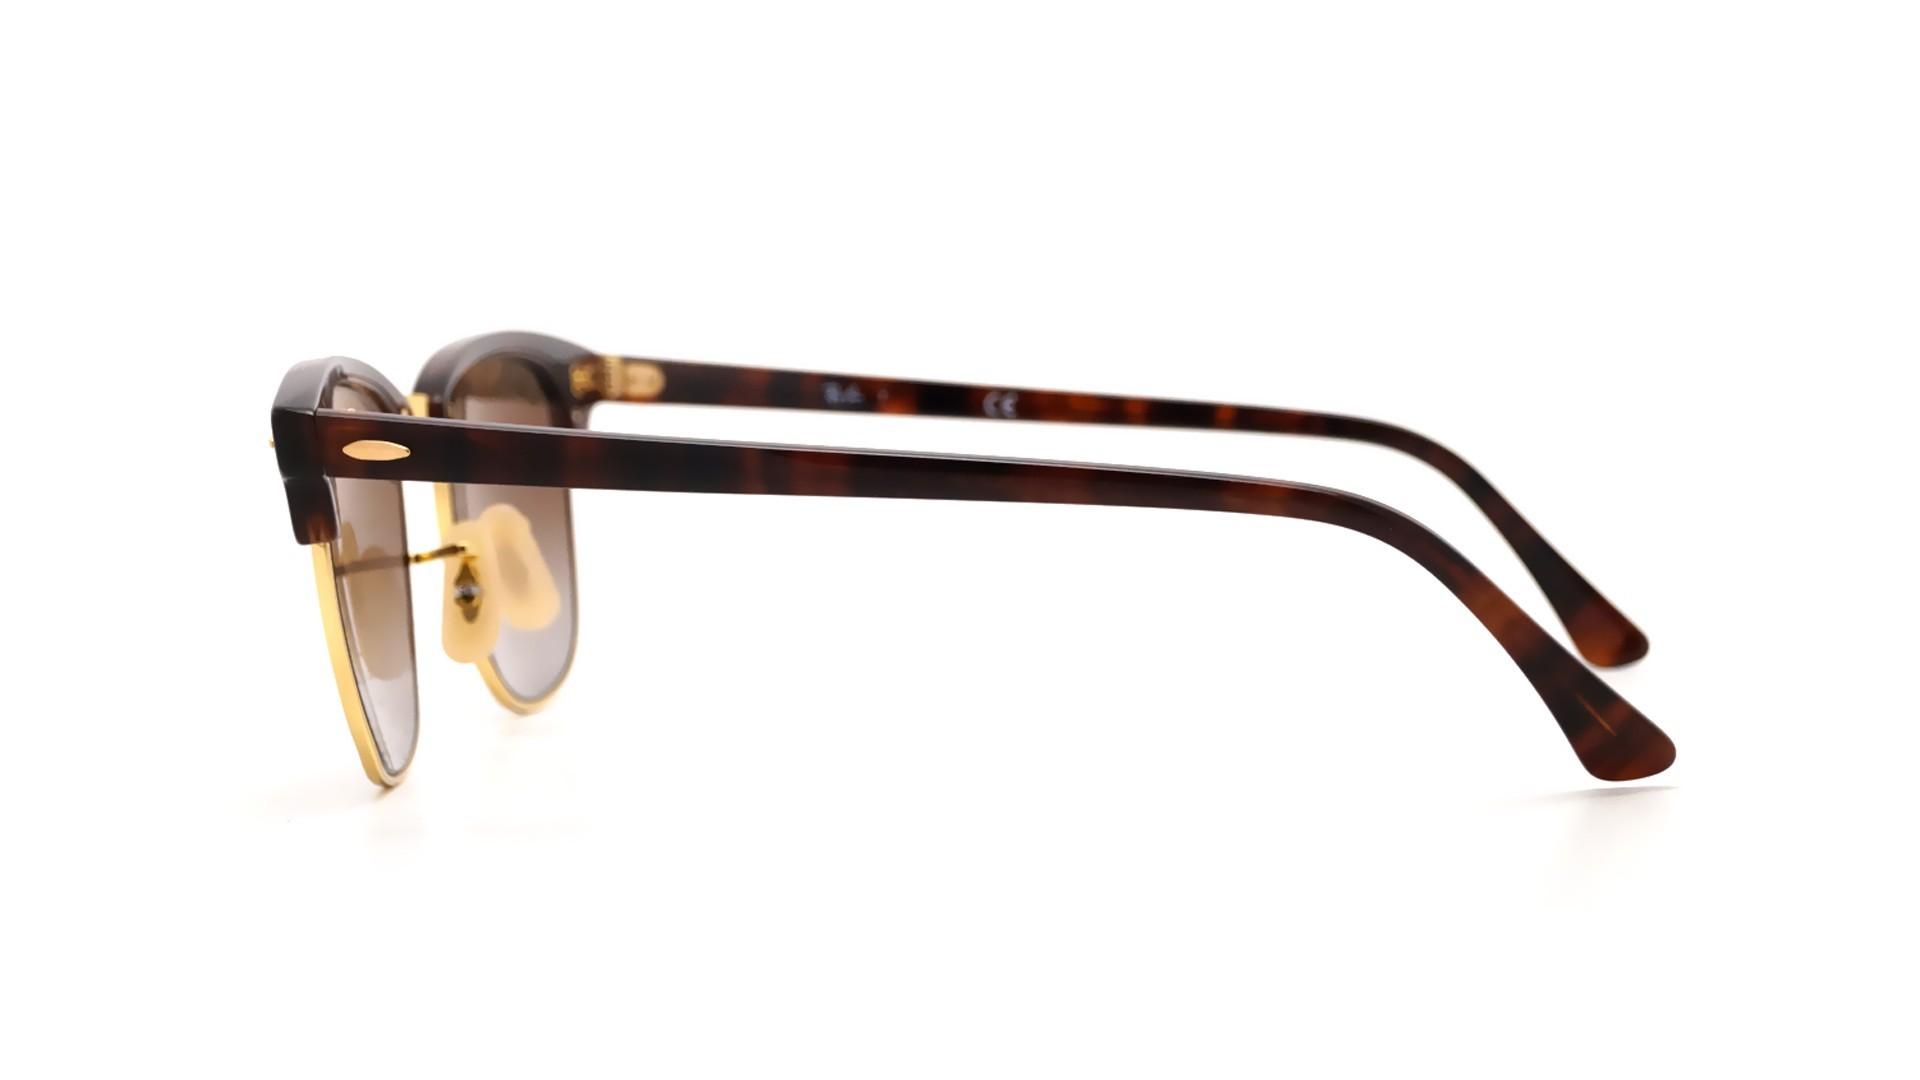 e9e649ab7a Sunglasses Ray-Ban Clubmaster Tortoise RB3016 990 9J 51-21 Medium Gradient  Mirror